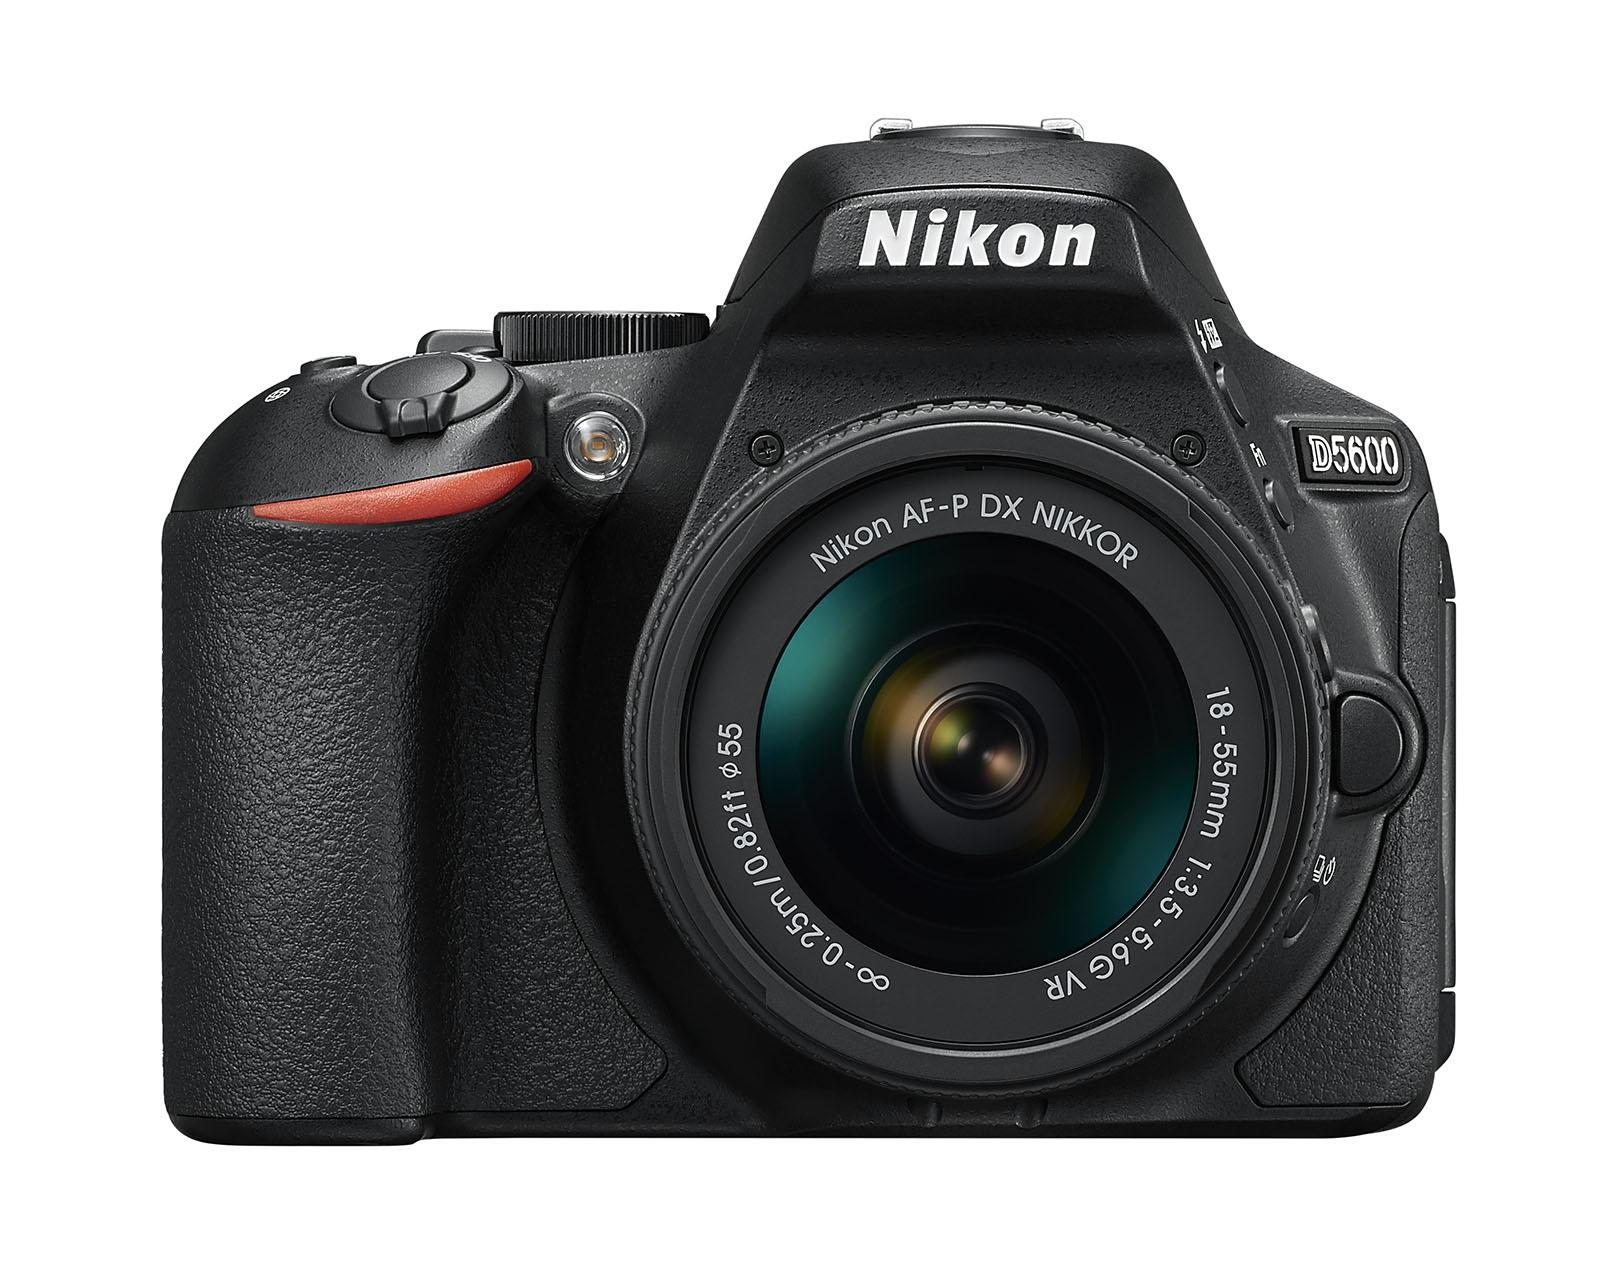 Nikon D5600 review | Digital Camera World